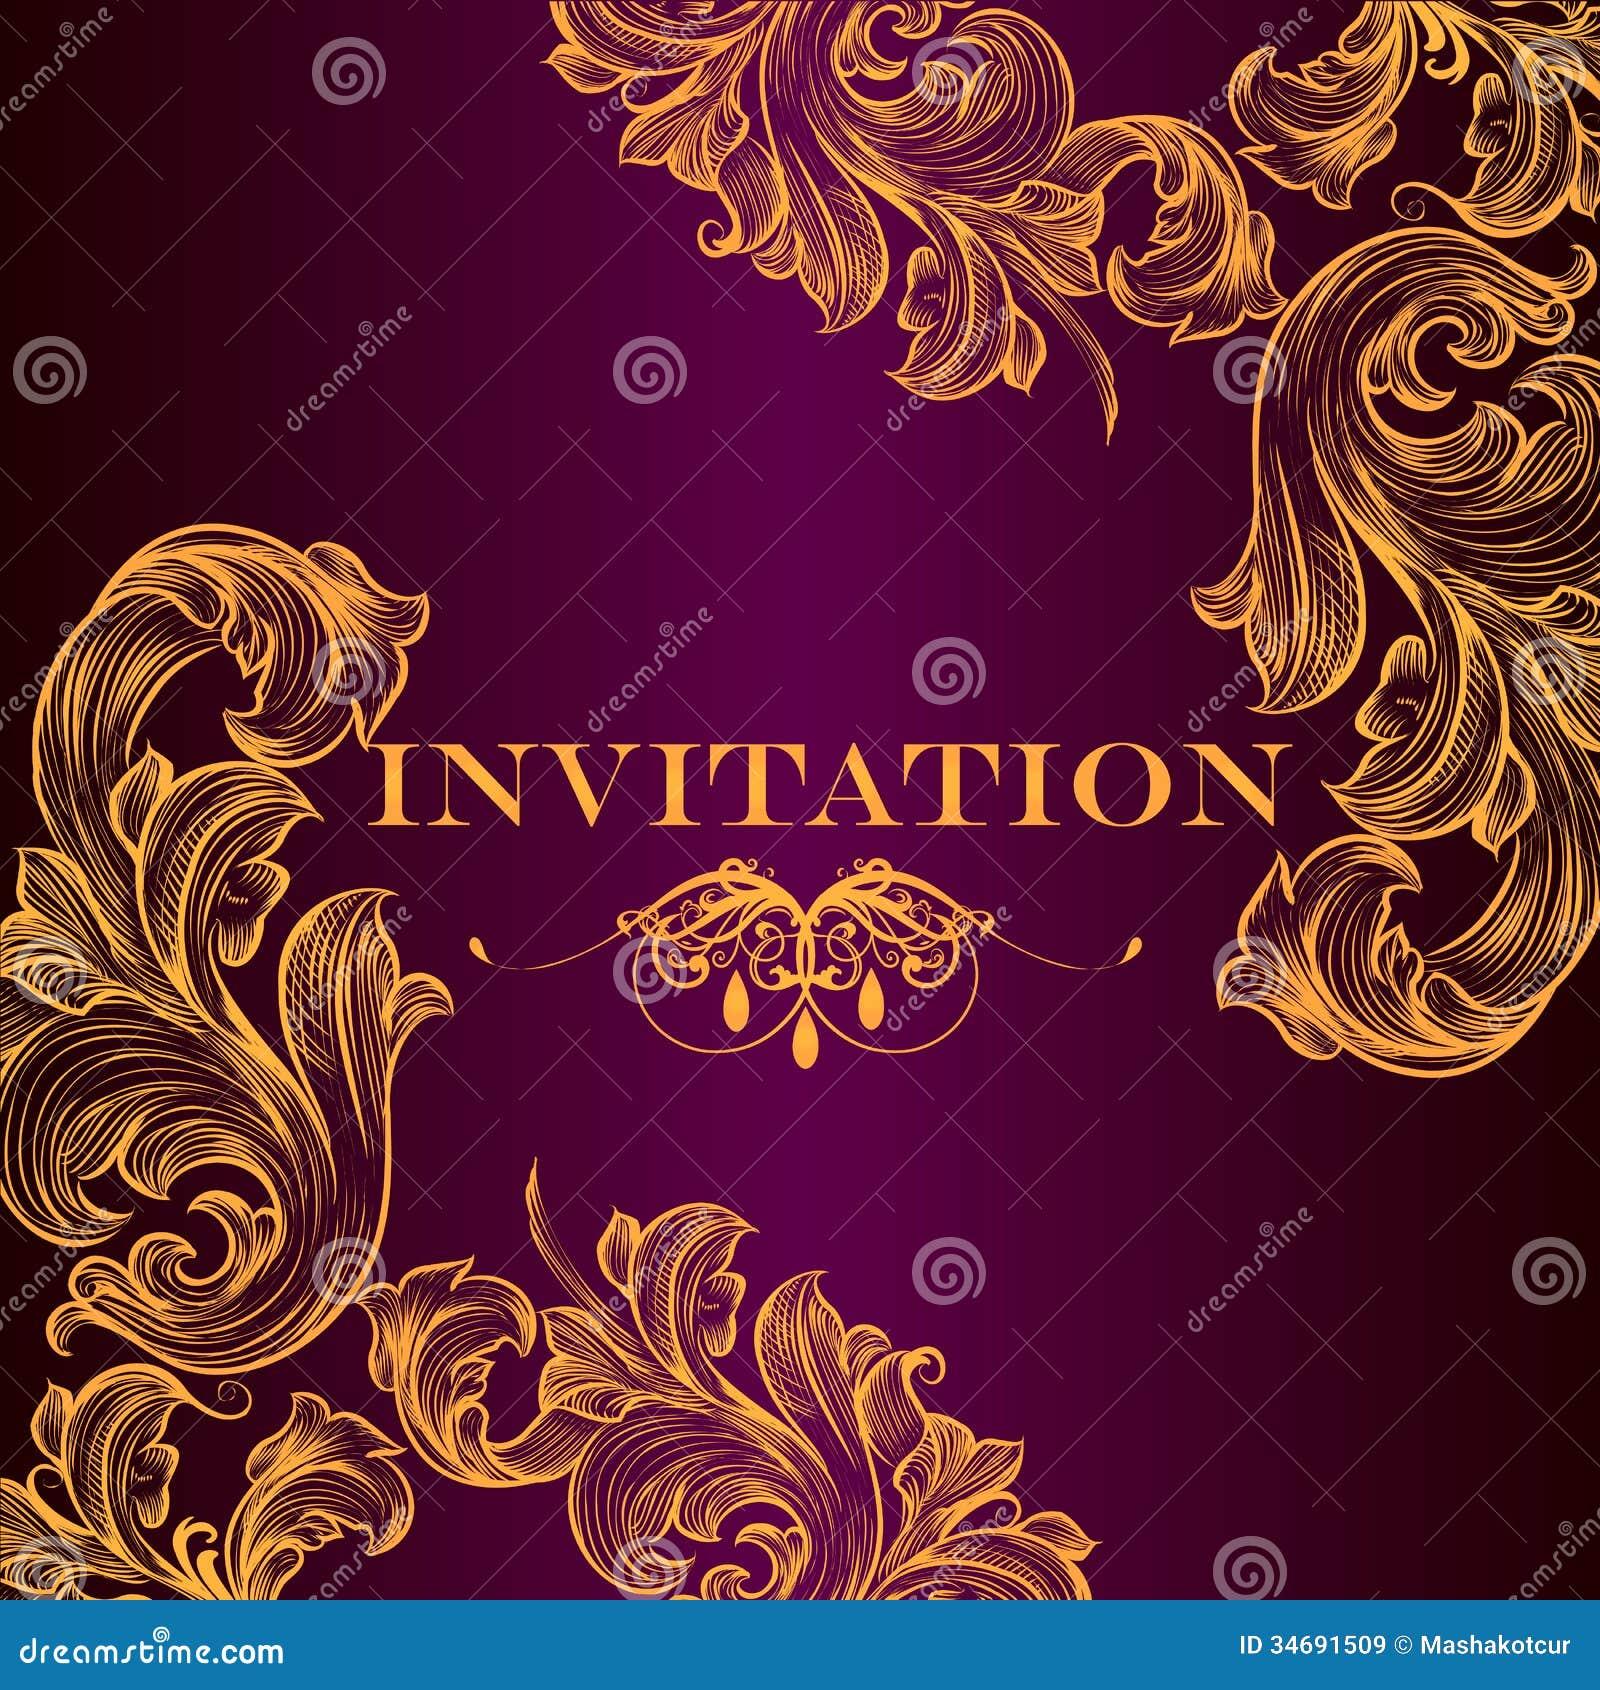 Vintage Wedding Invitation Designs for best invitations template